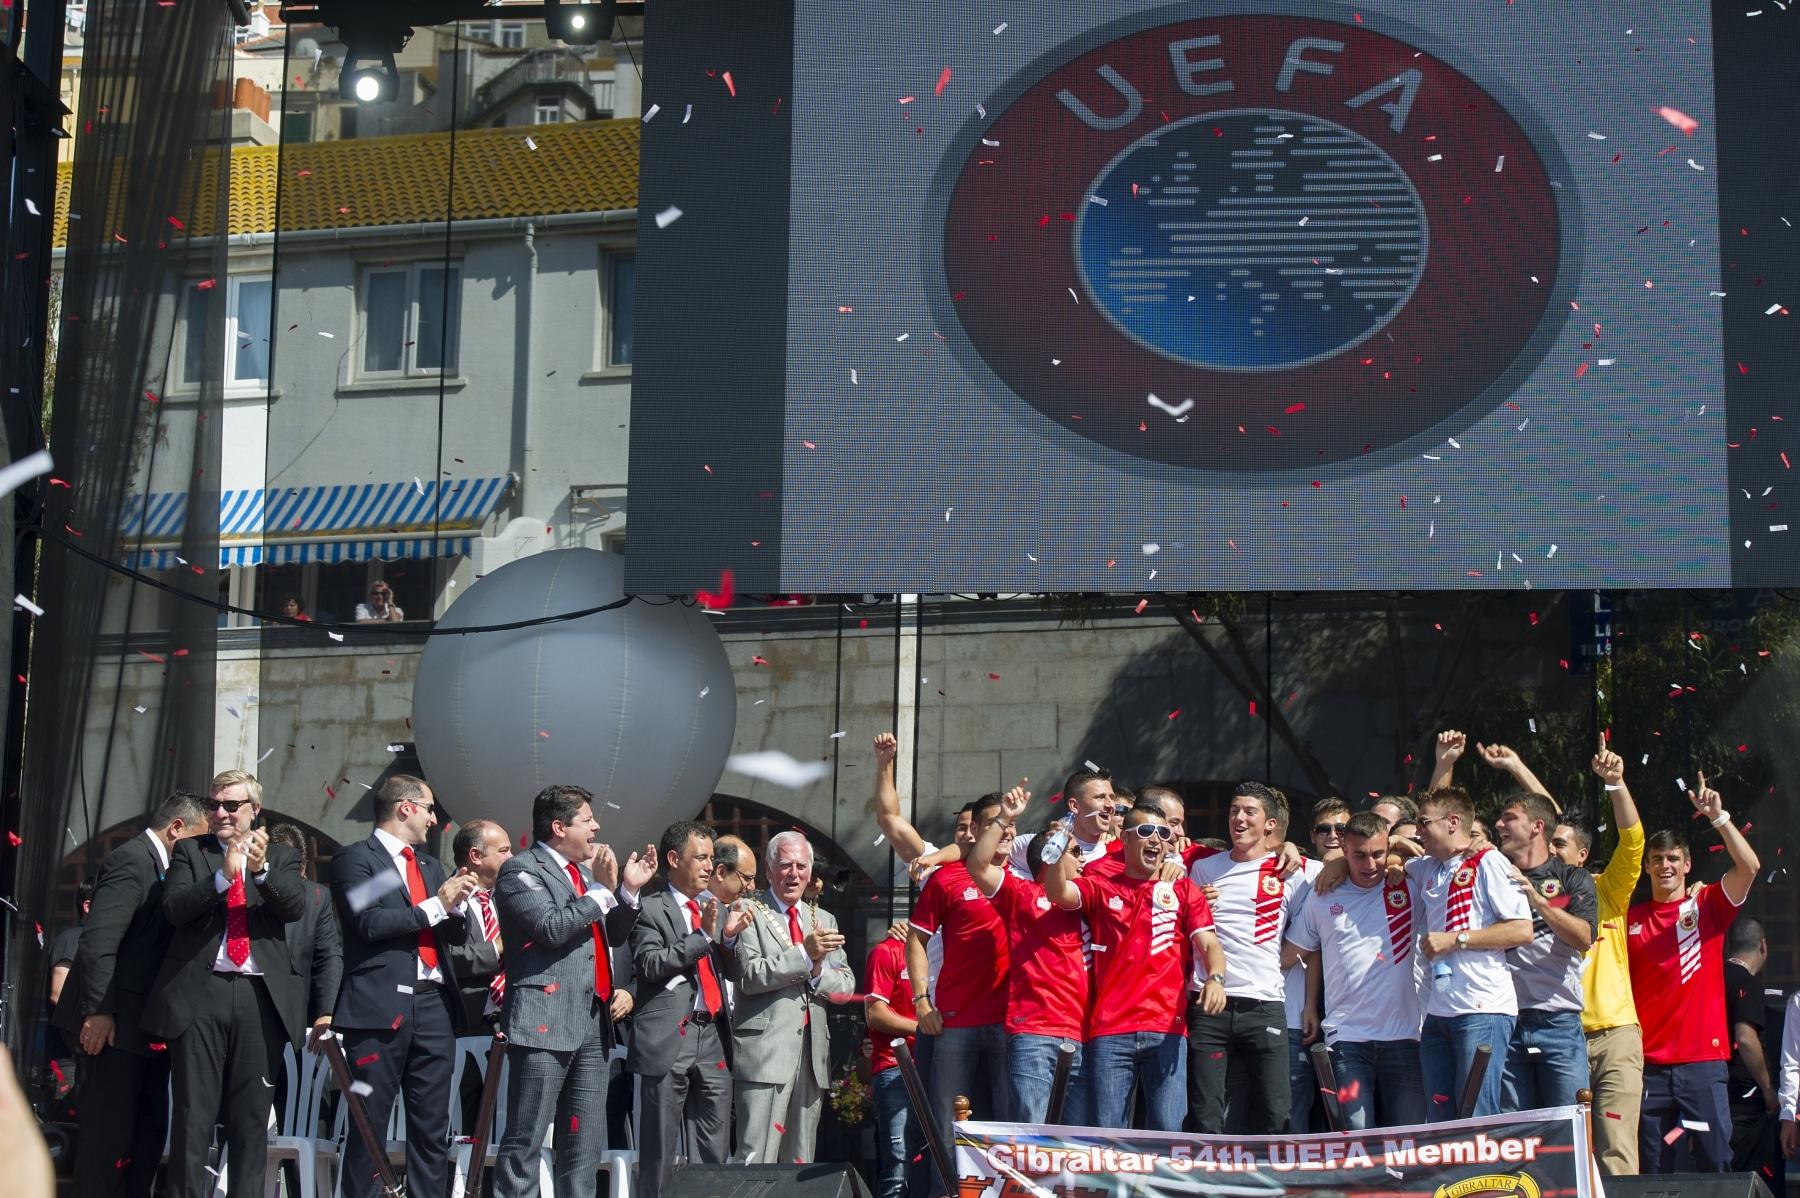 celebracin-entrada-gibraltar-en-la-uefa-13_9222042473_o